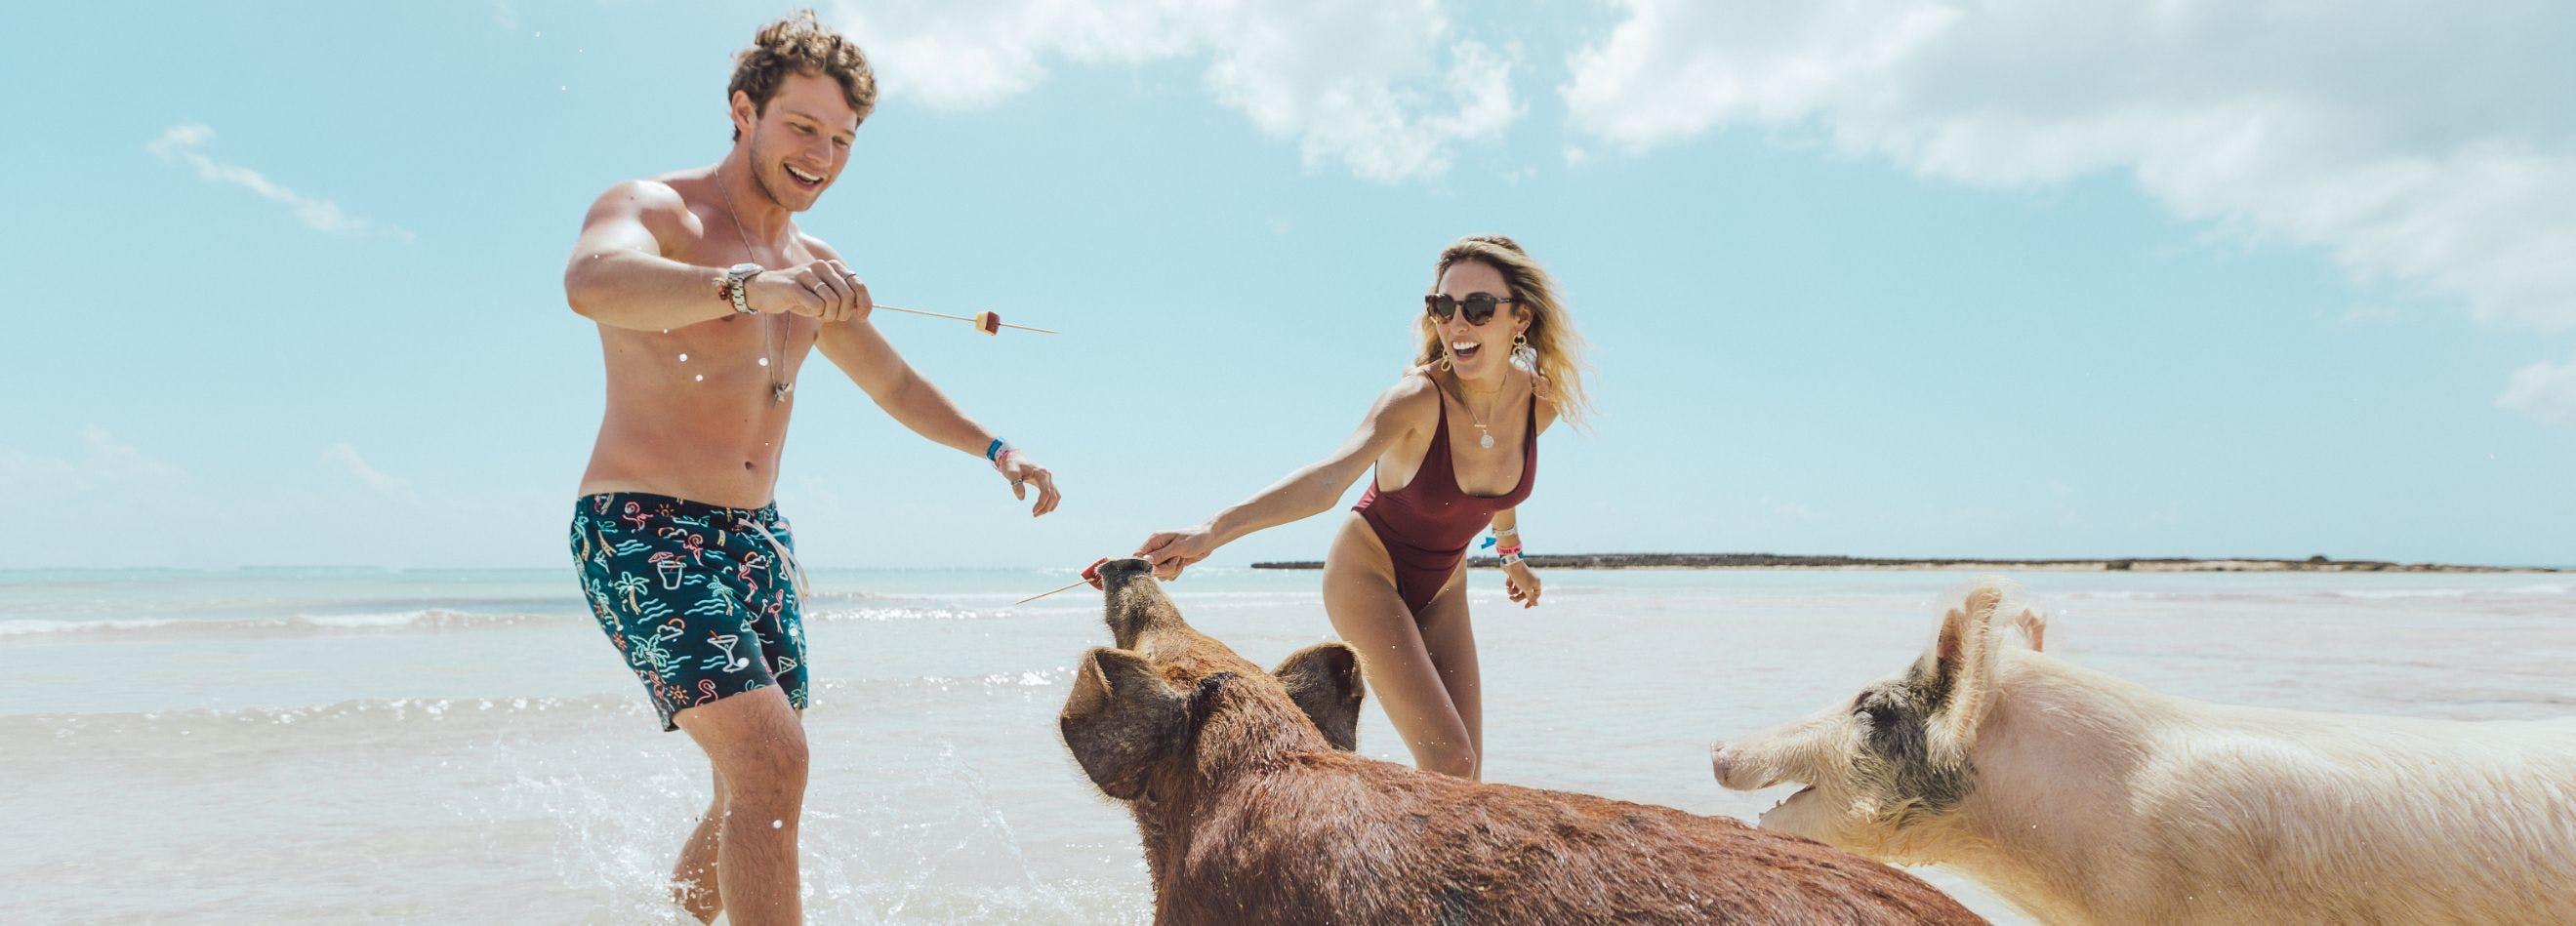 pigs on beach grand bahama